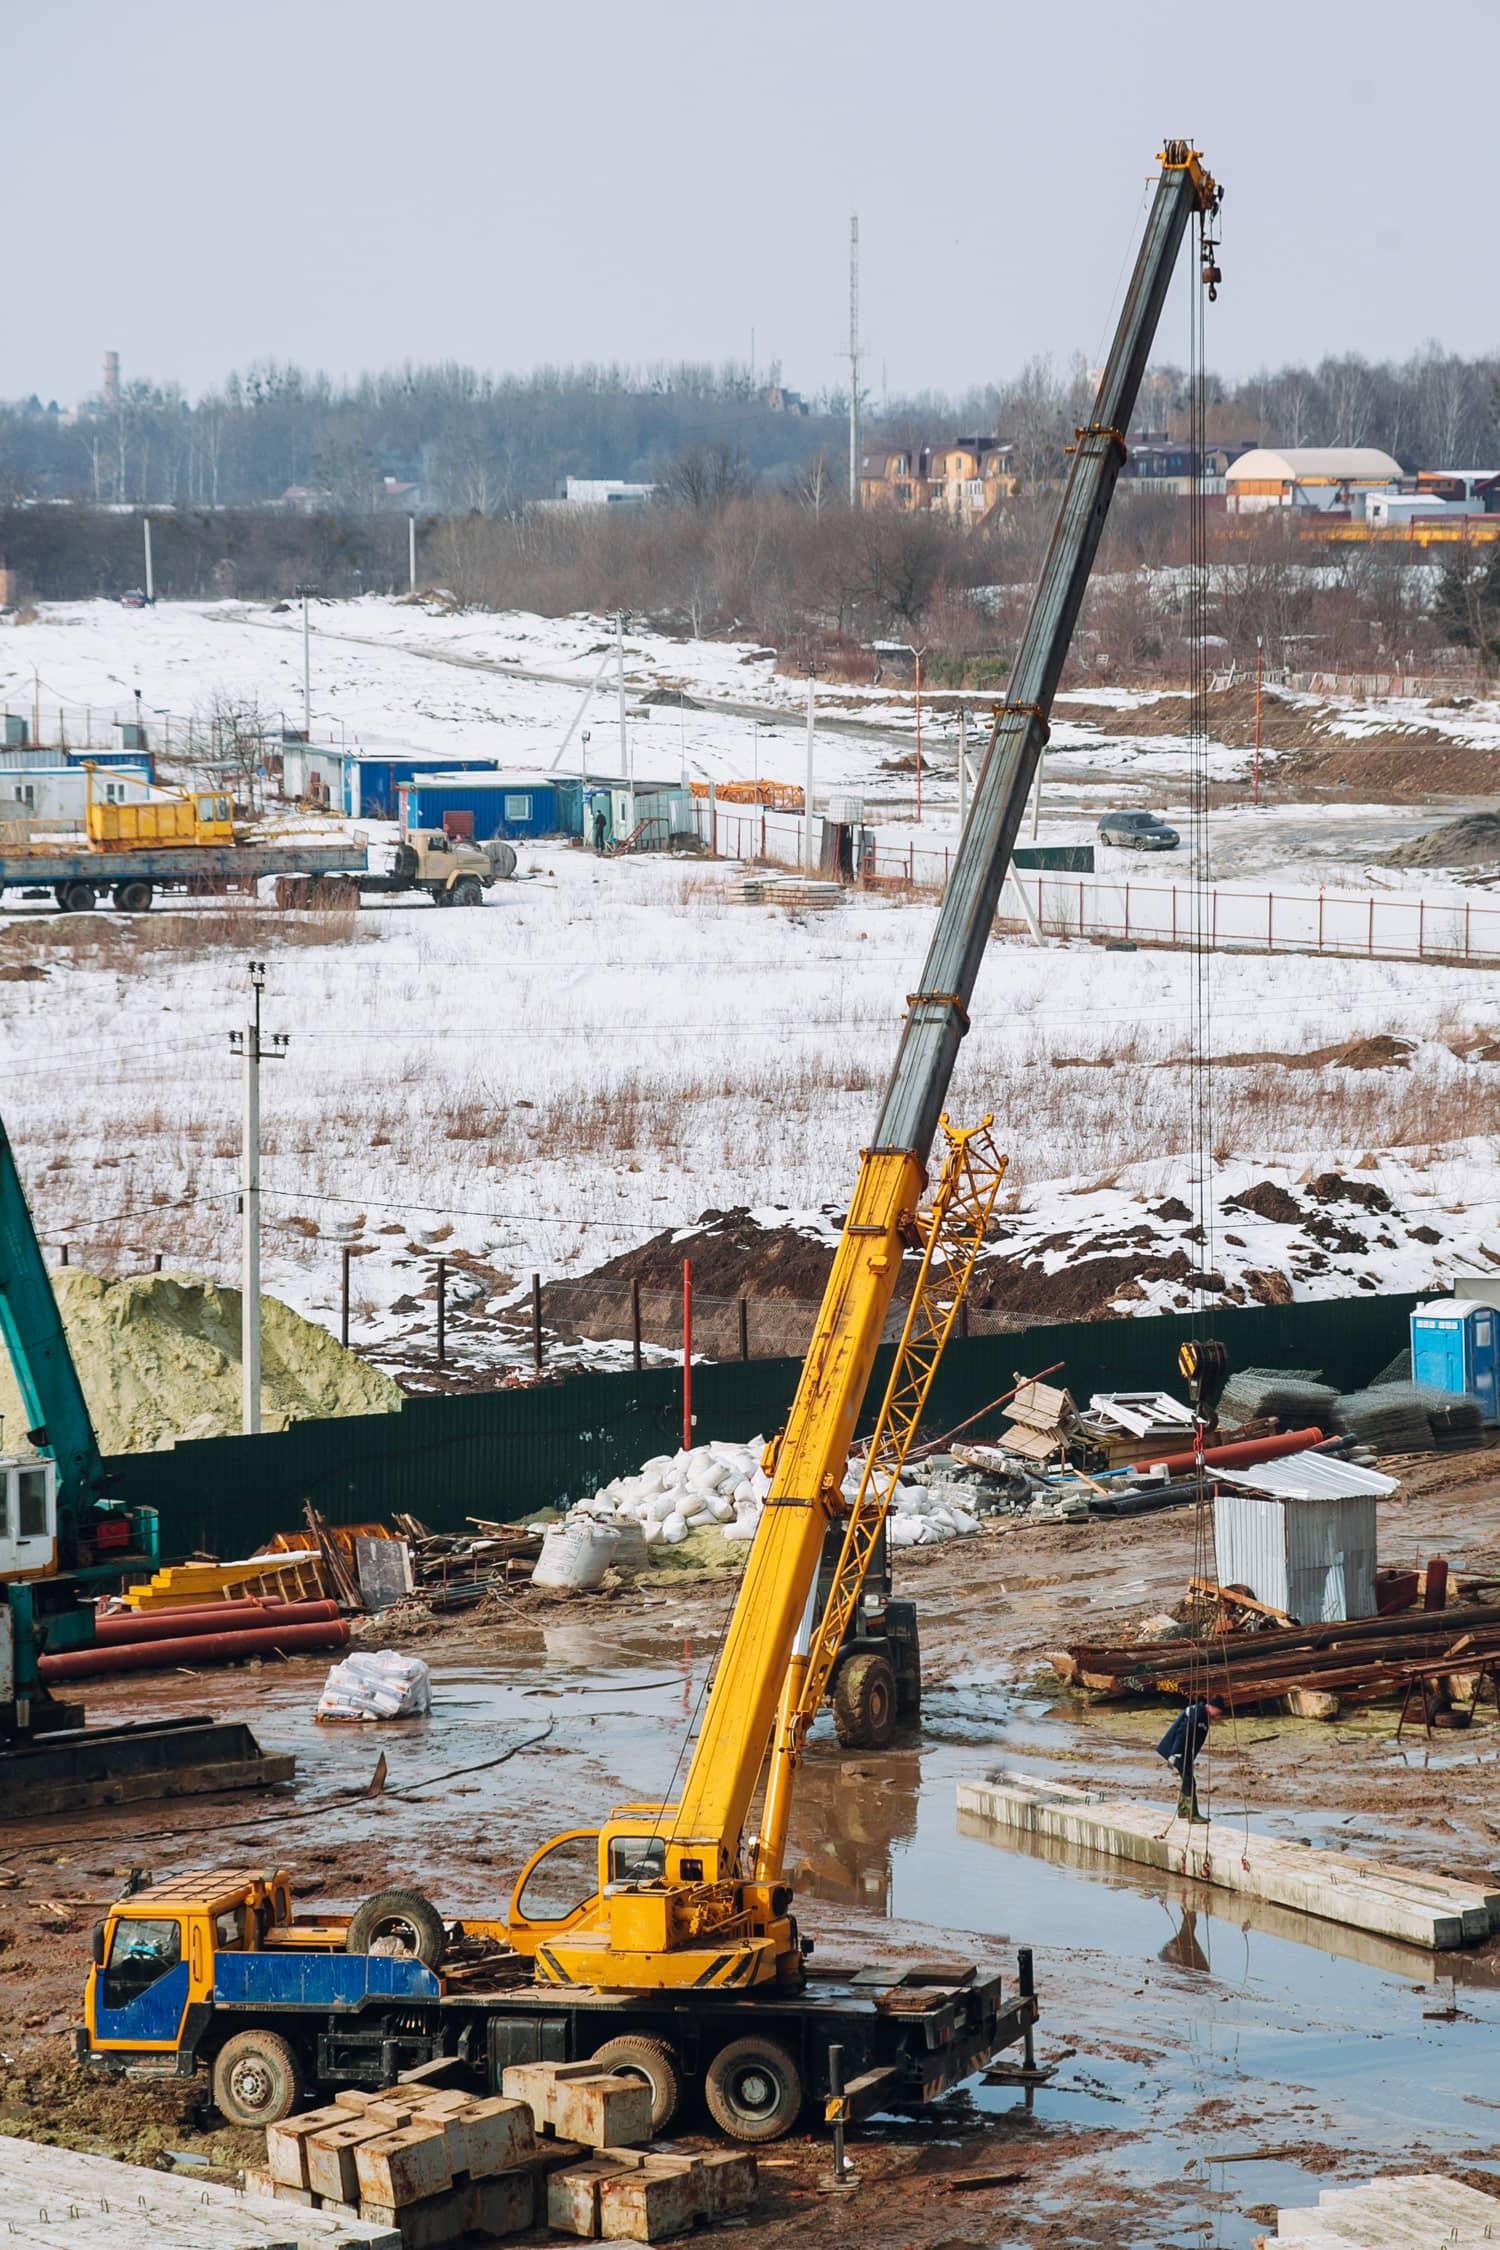 Single crane lifting in snow